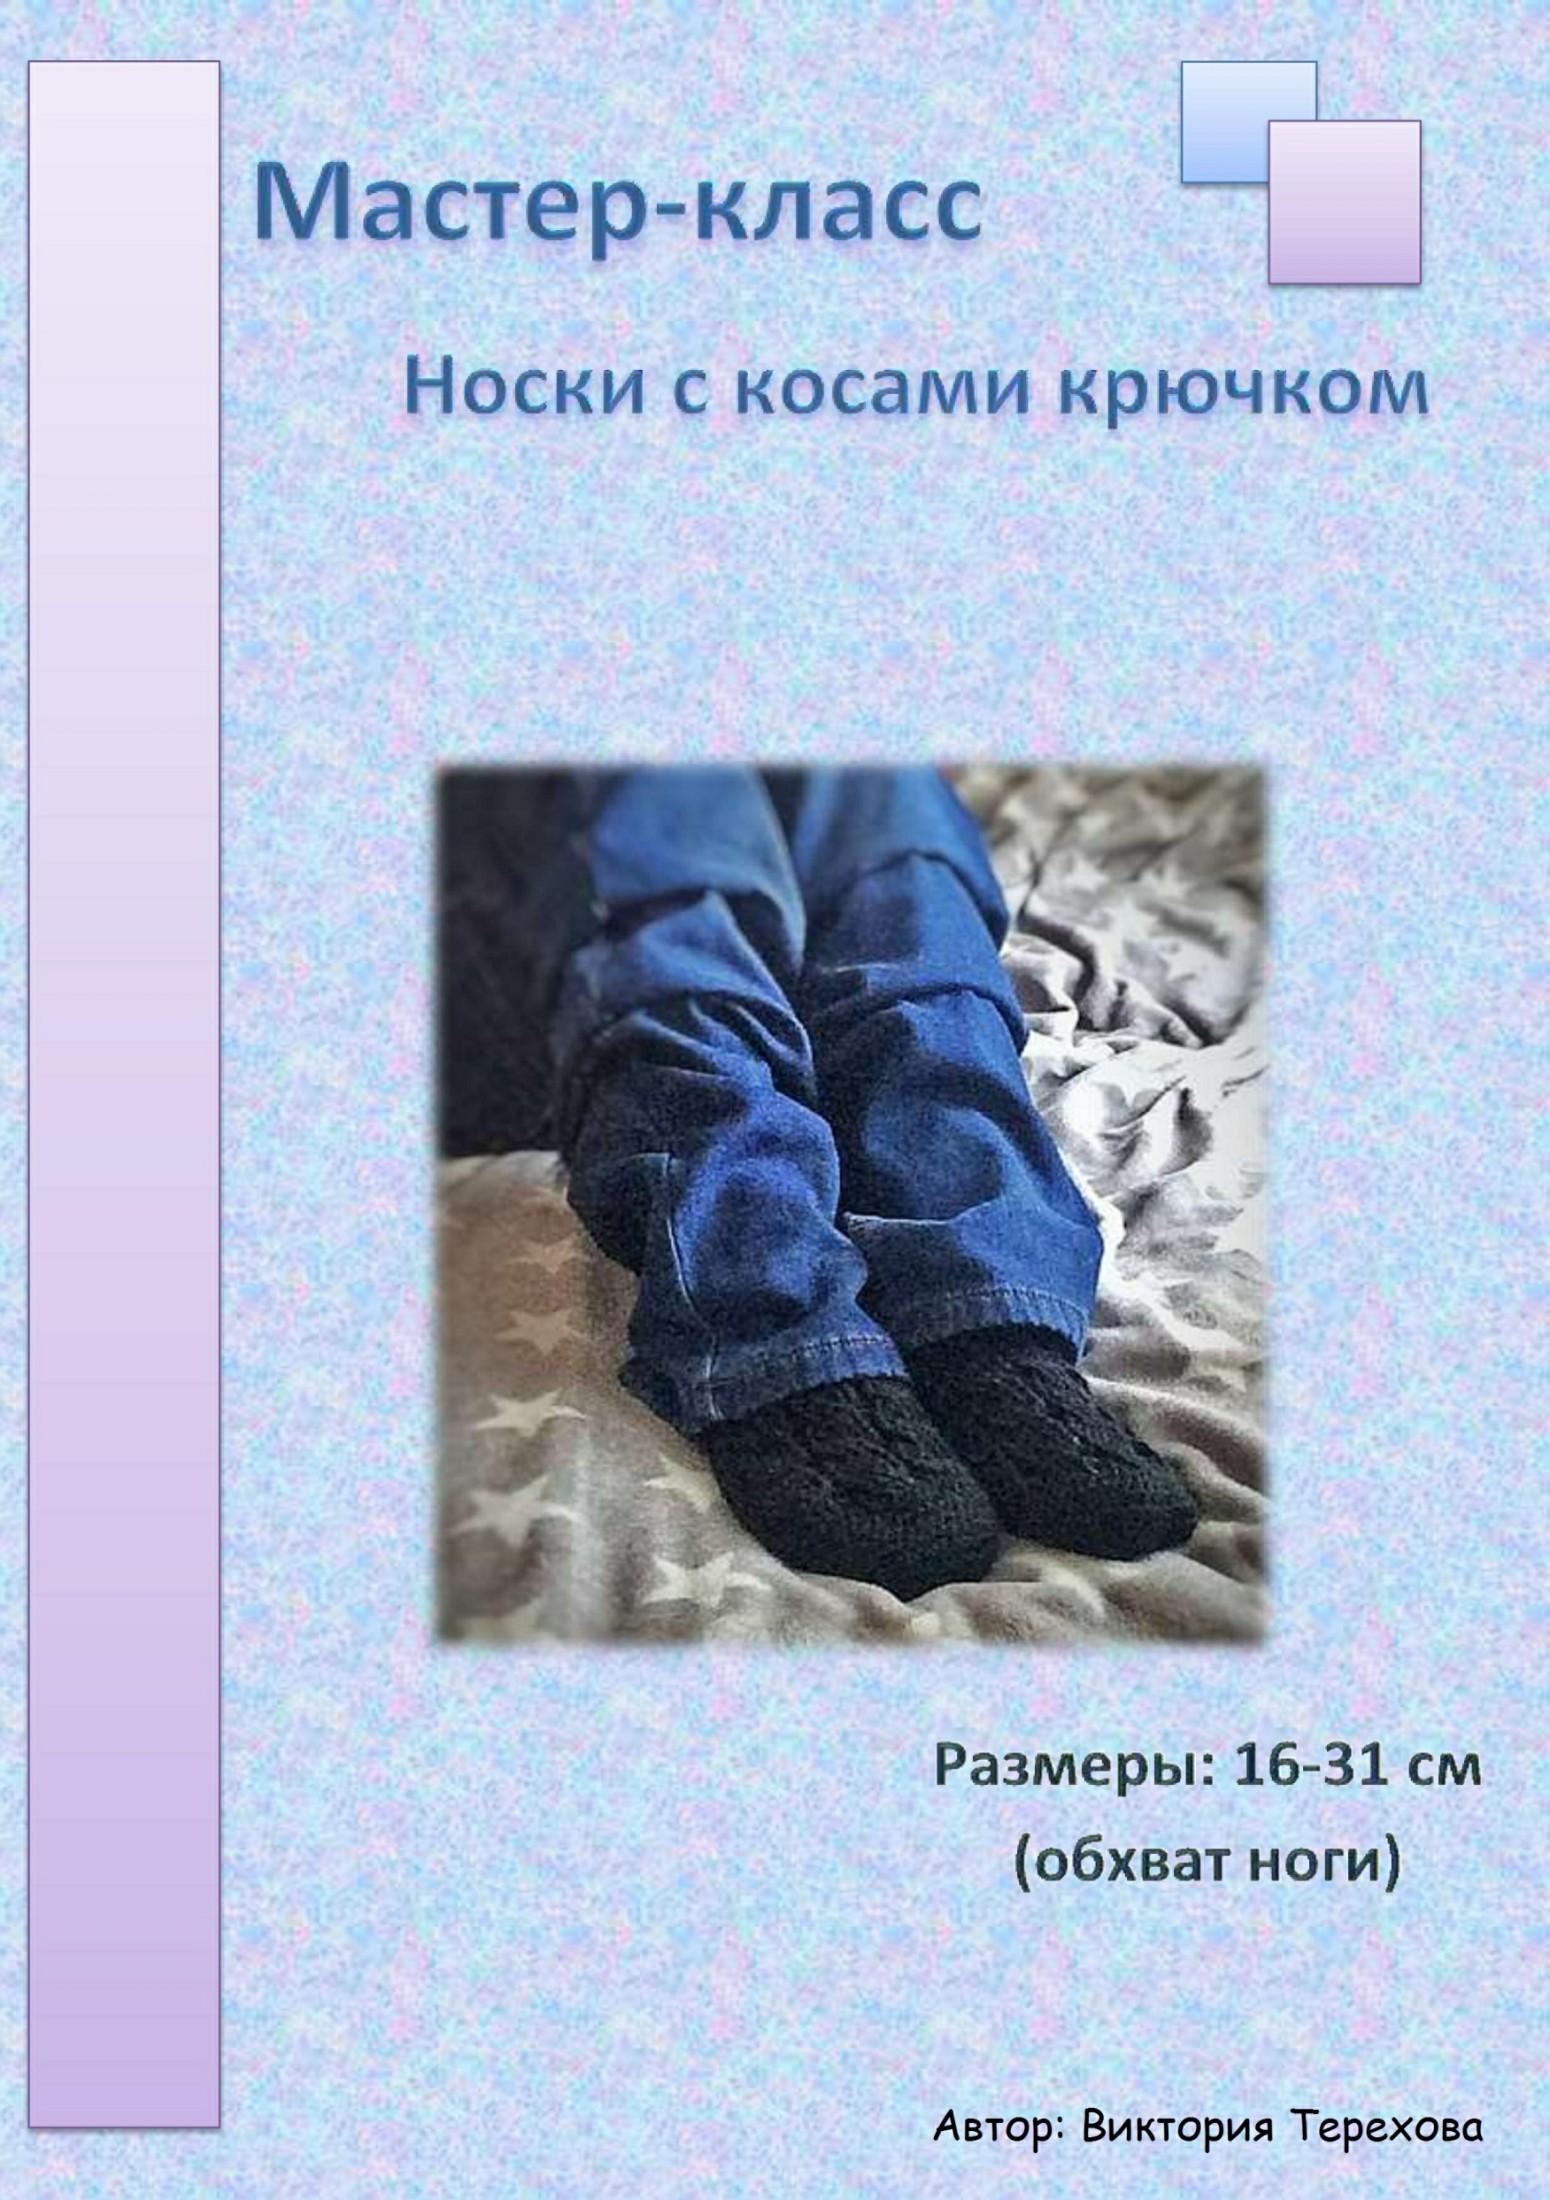 Виктория Терехова Мастер-класс: Носки с косами крючком цена